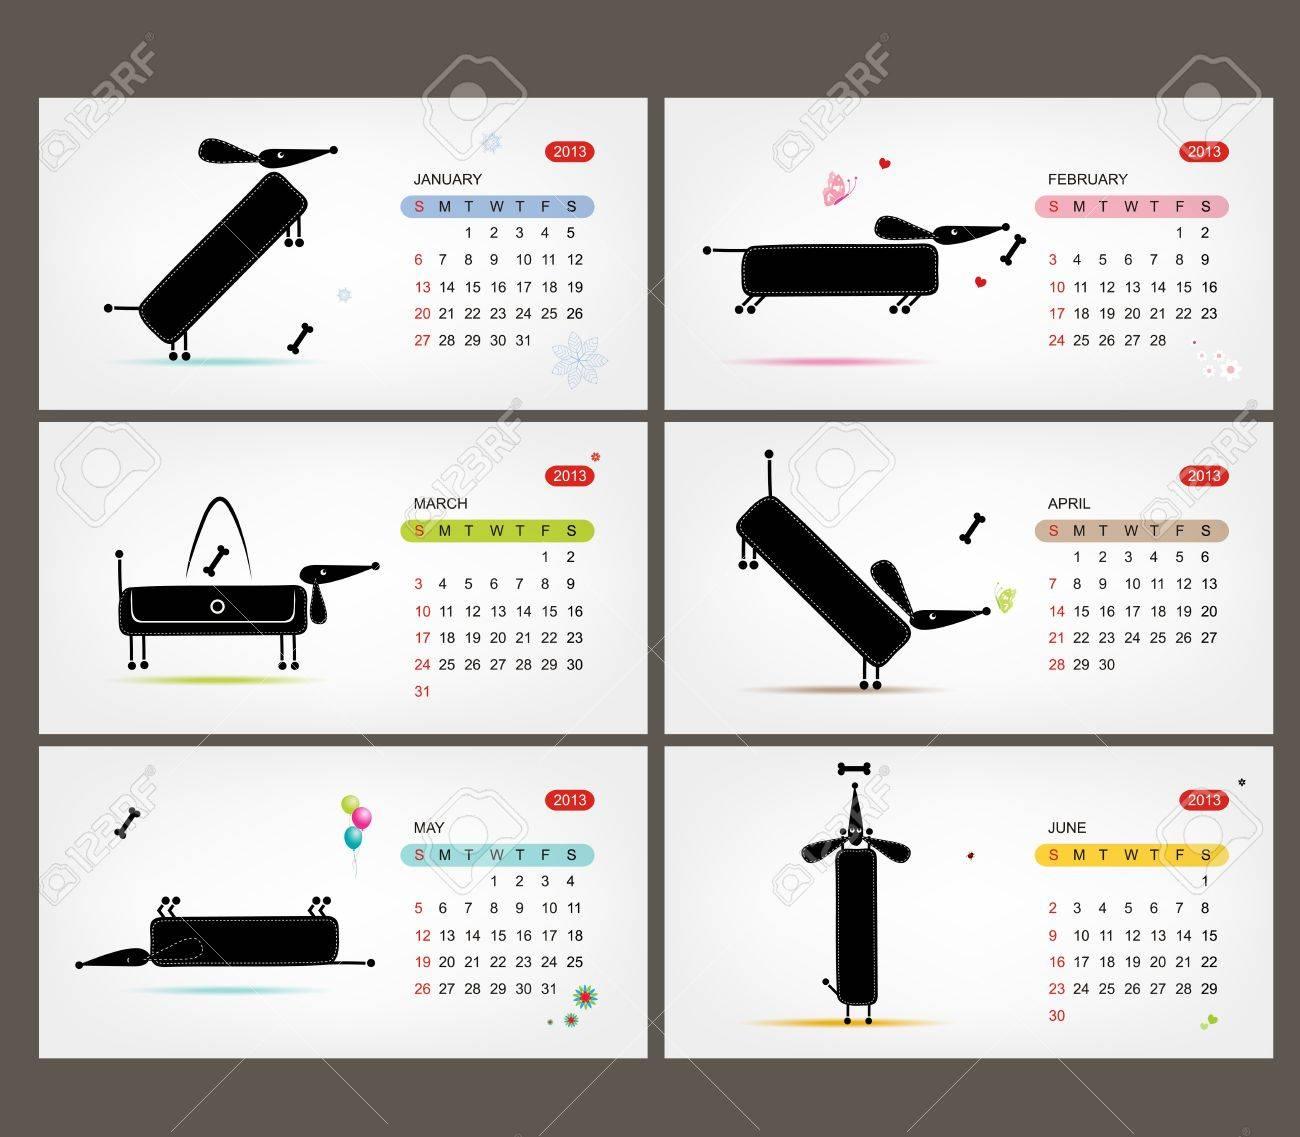 Vector calendar 2013  Funny dogs for each month Stock Vector - 19009331